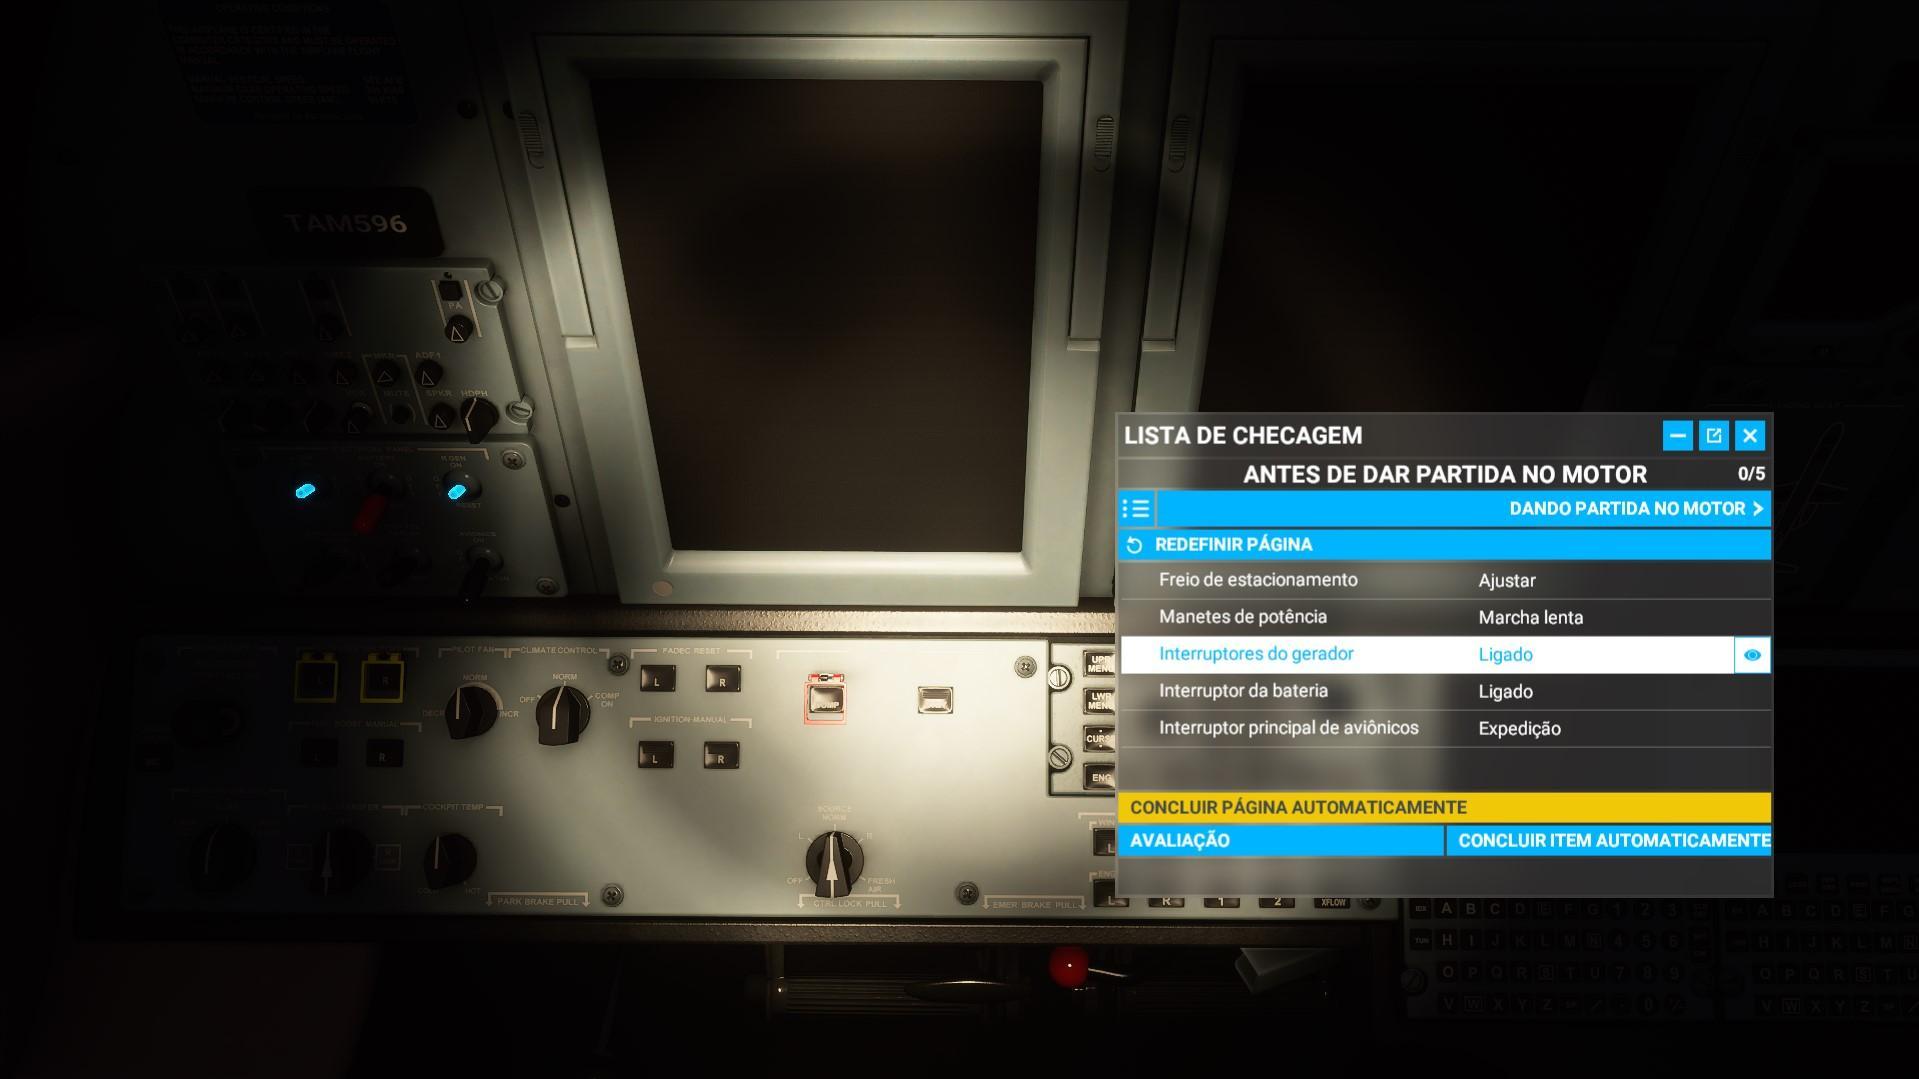 Antes de dar partida no motor flight simulator